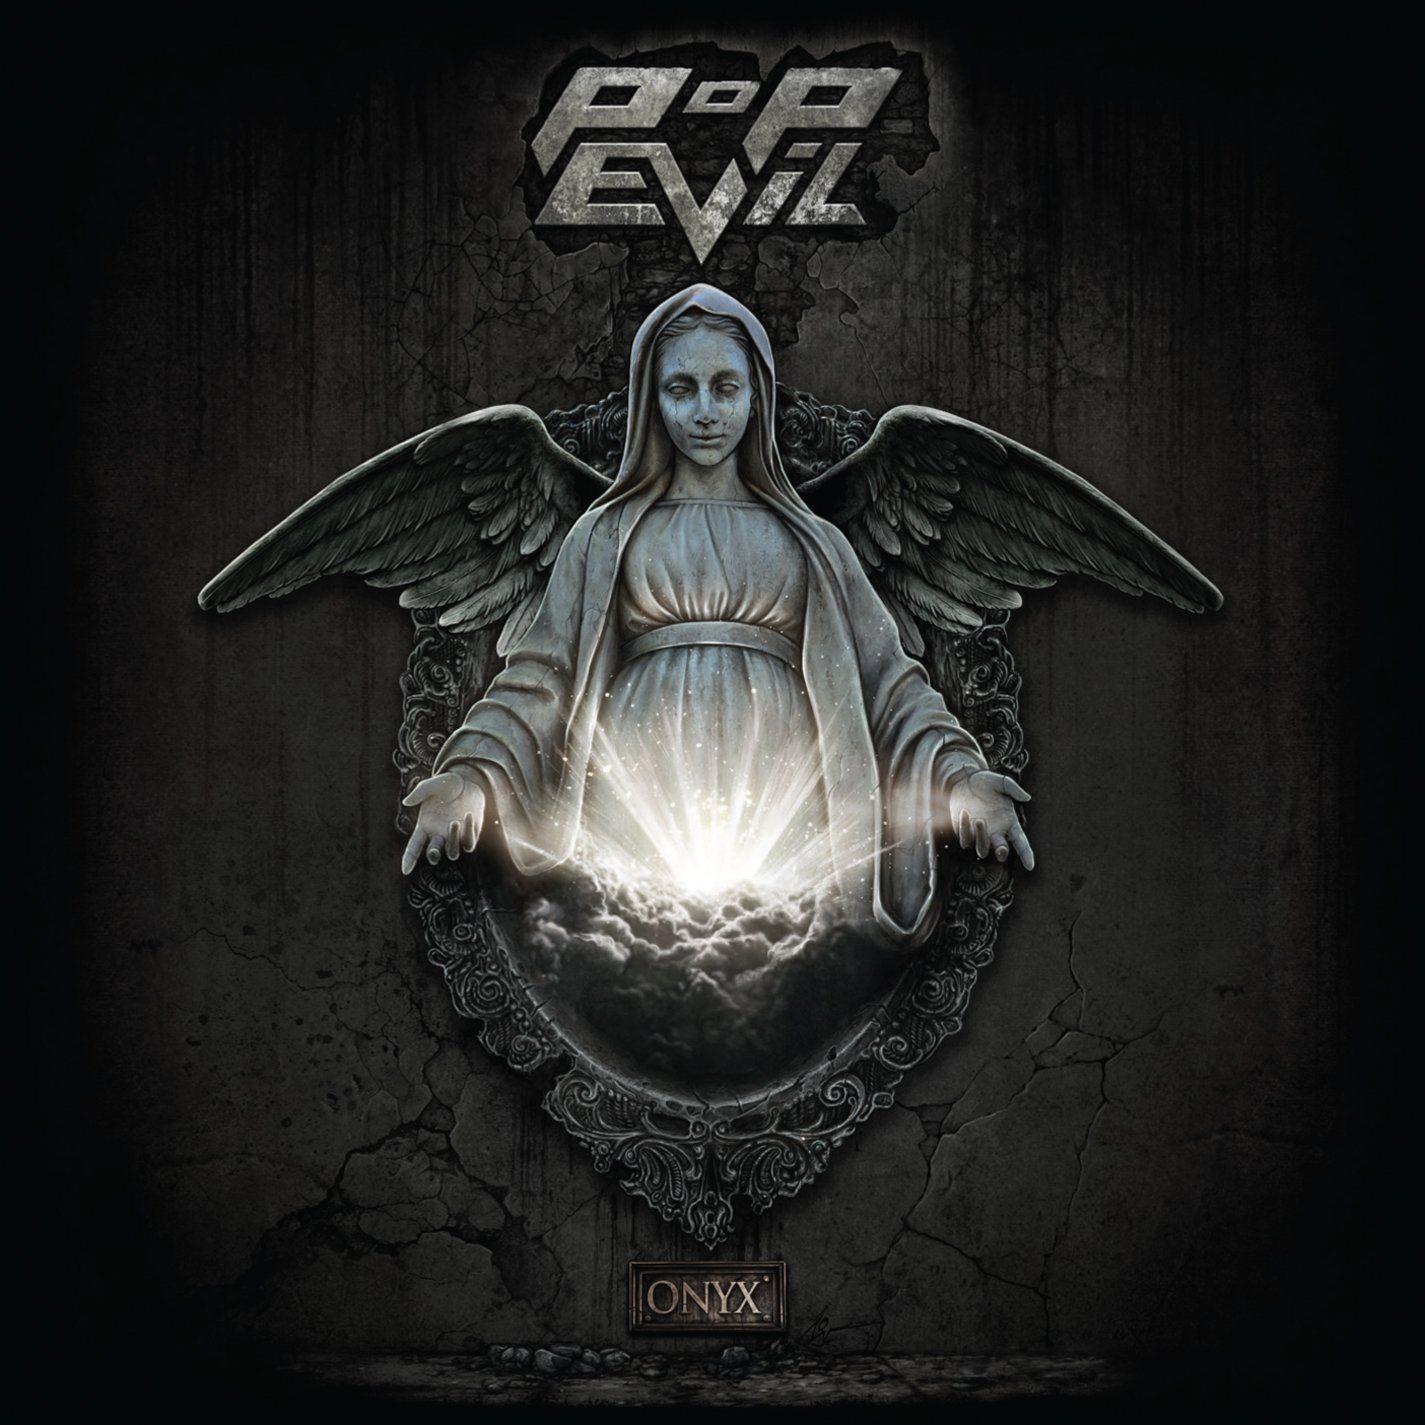 Pop Evil Onyx Cover